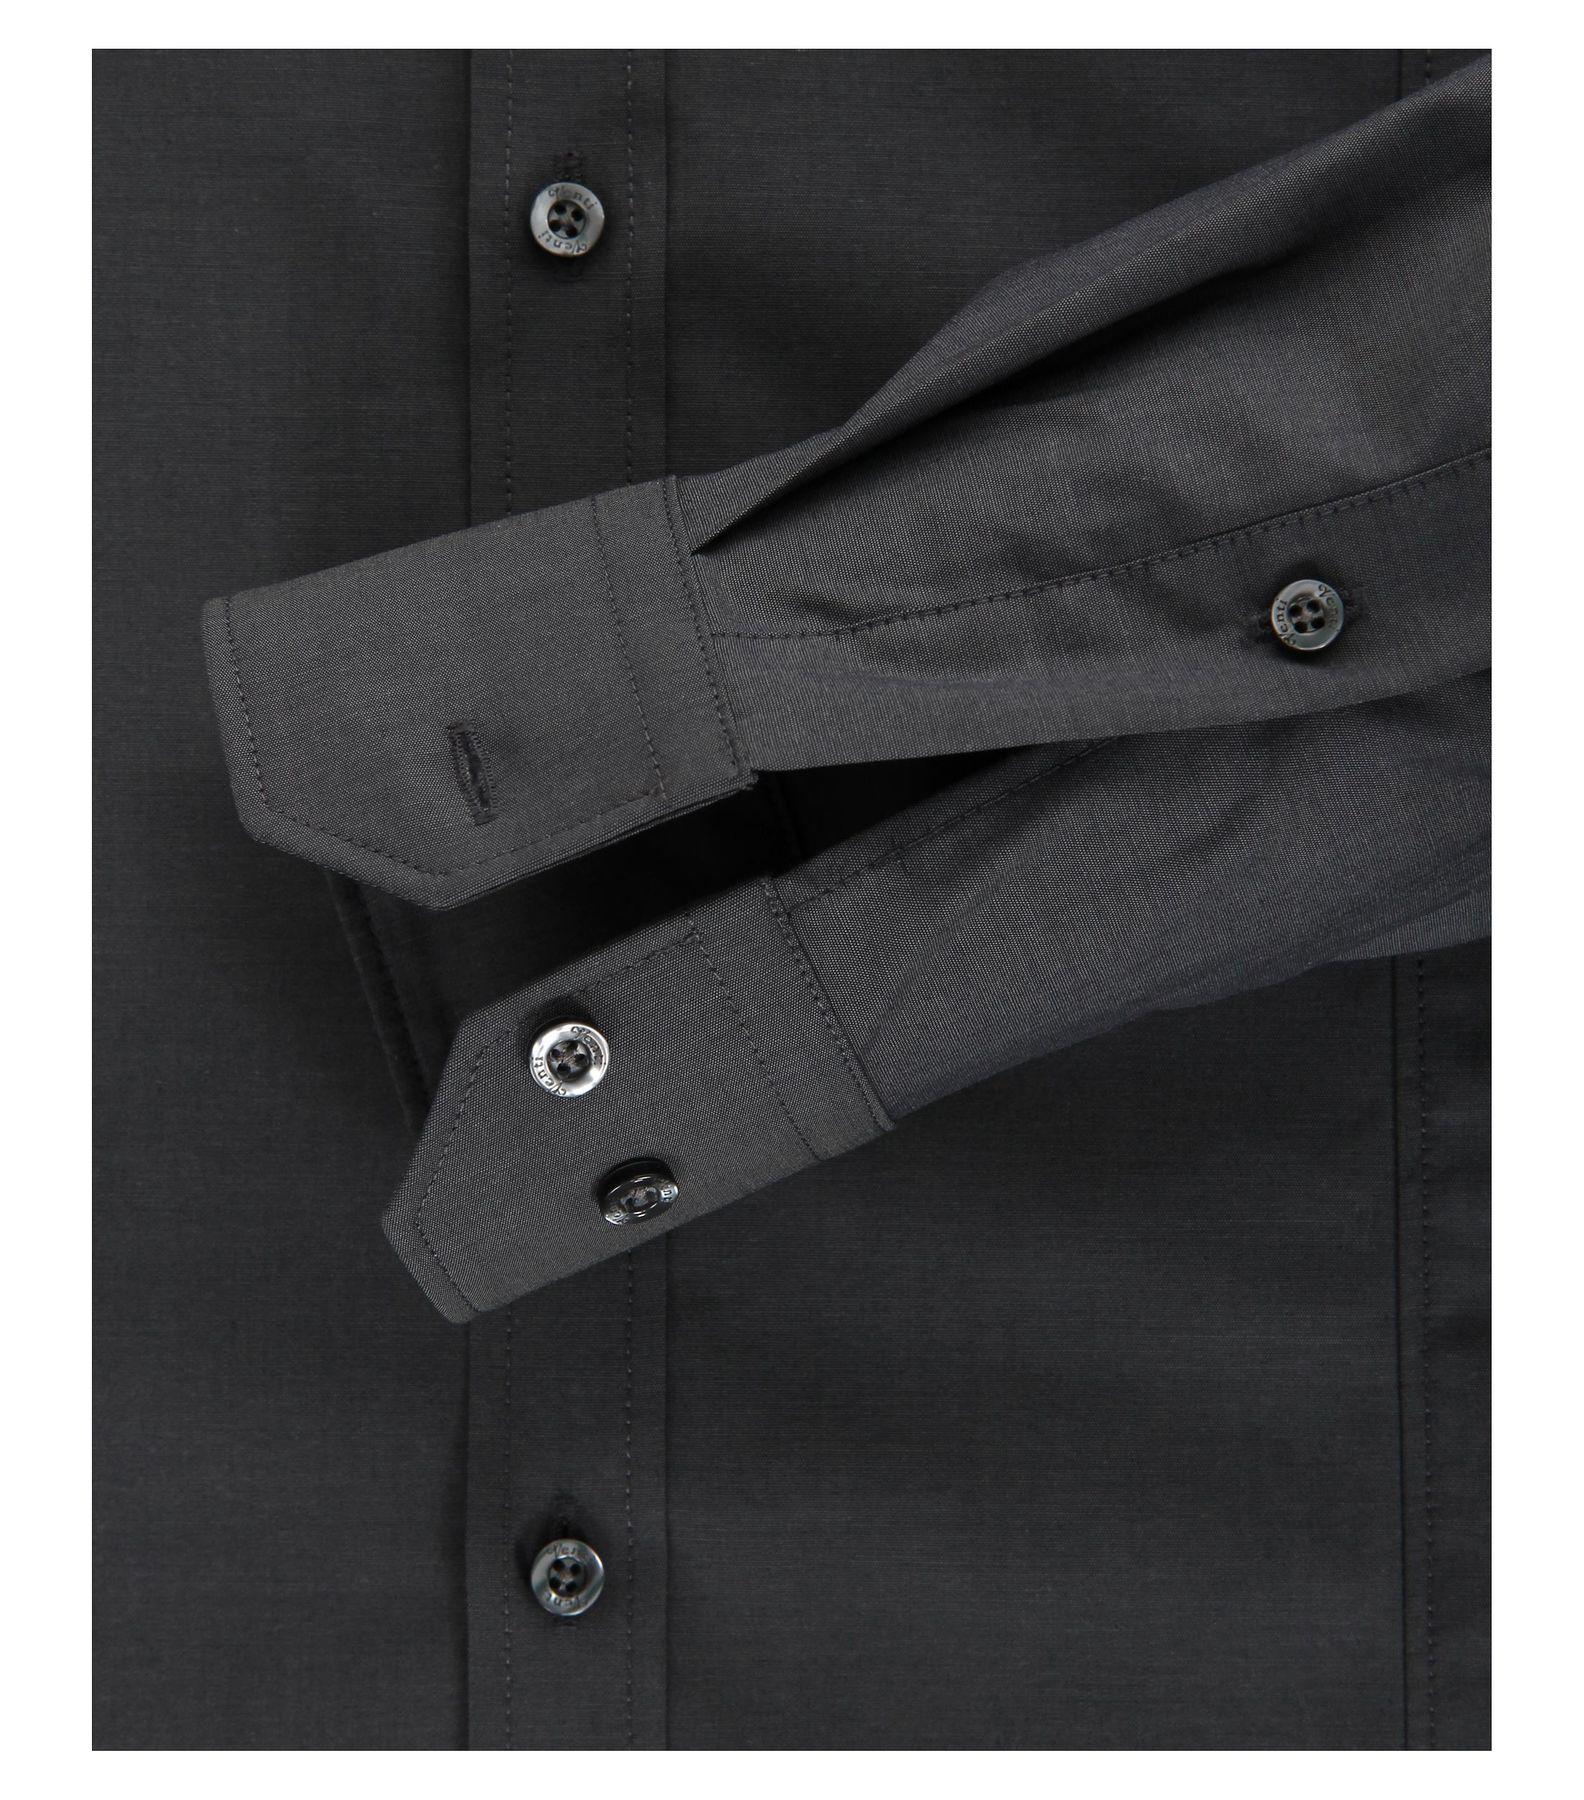 Venti - Body Fit/Super Slim Fit - Bügelfreies Herren Langarm Hemd in diversen Farben (001470) – Bild 12